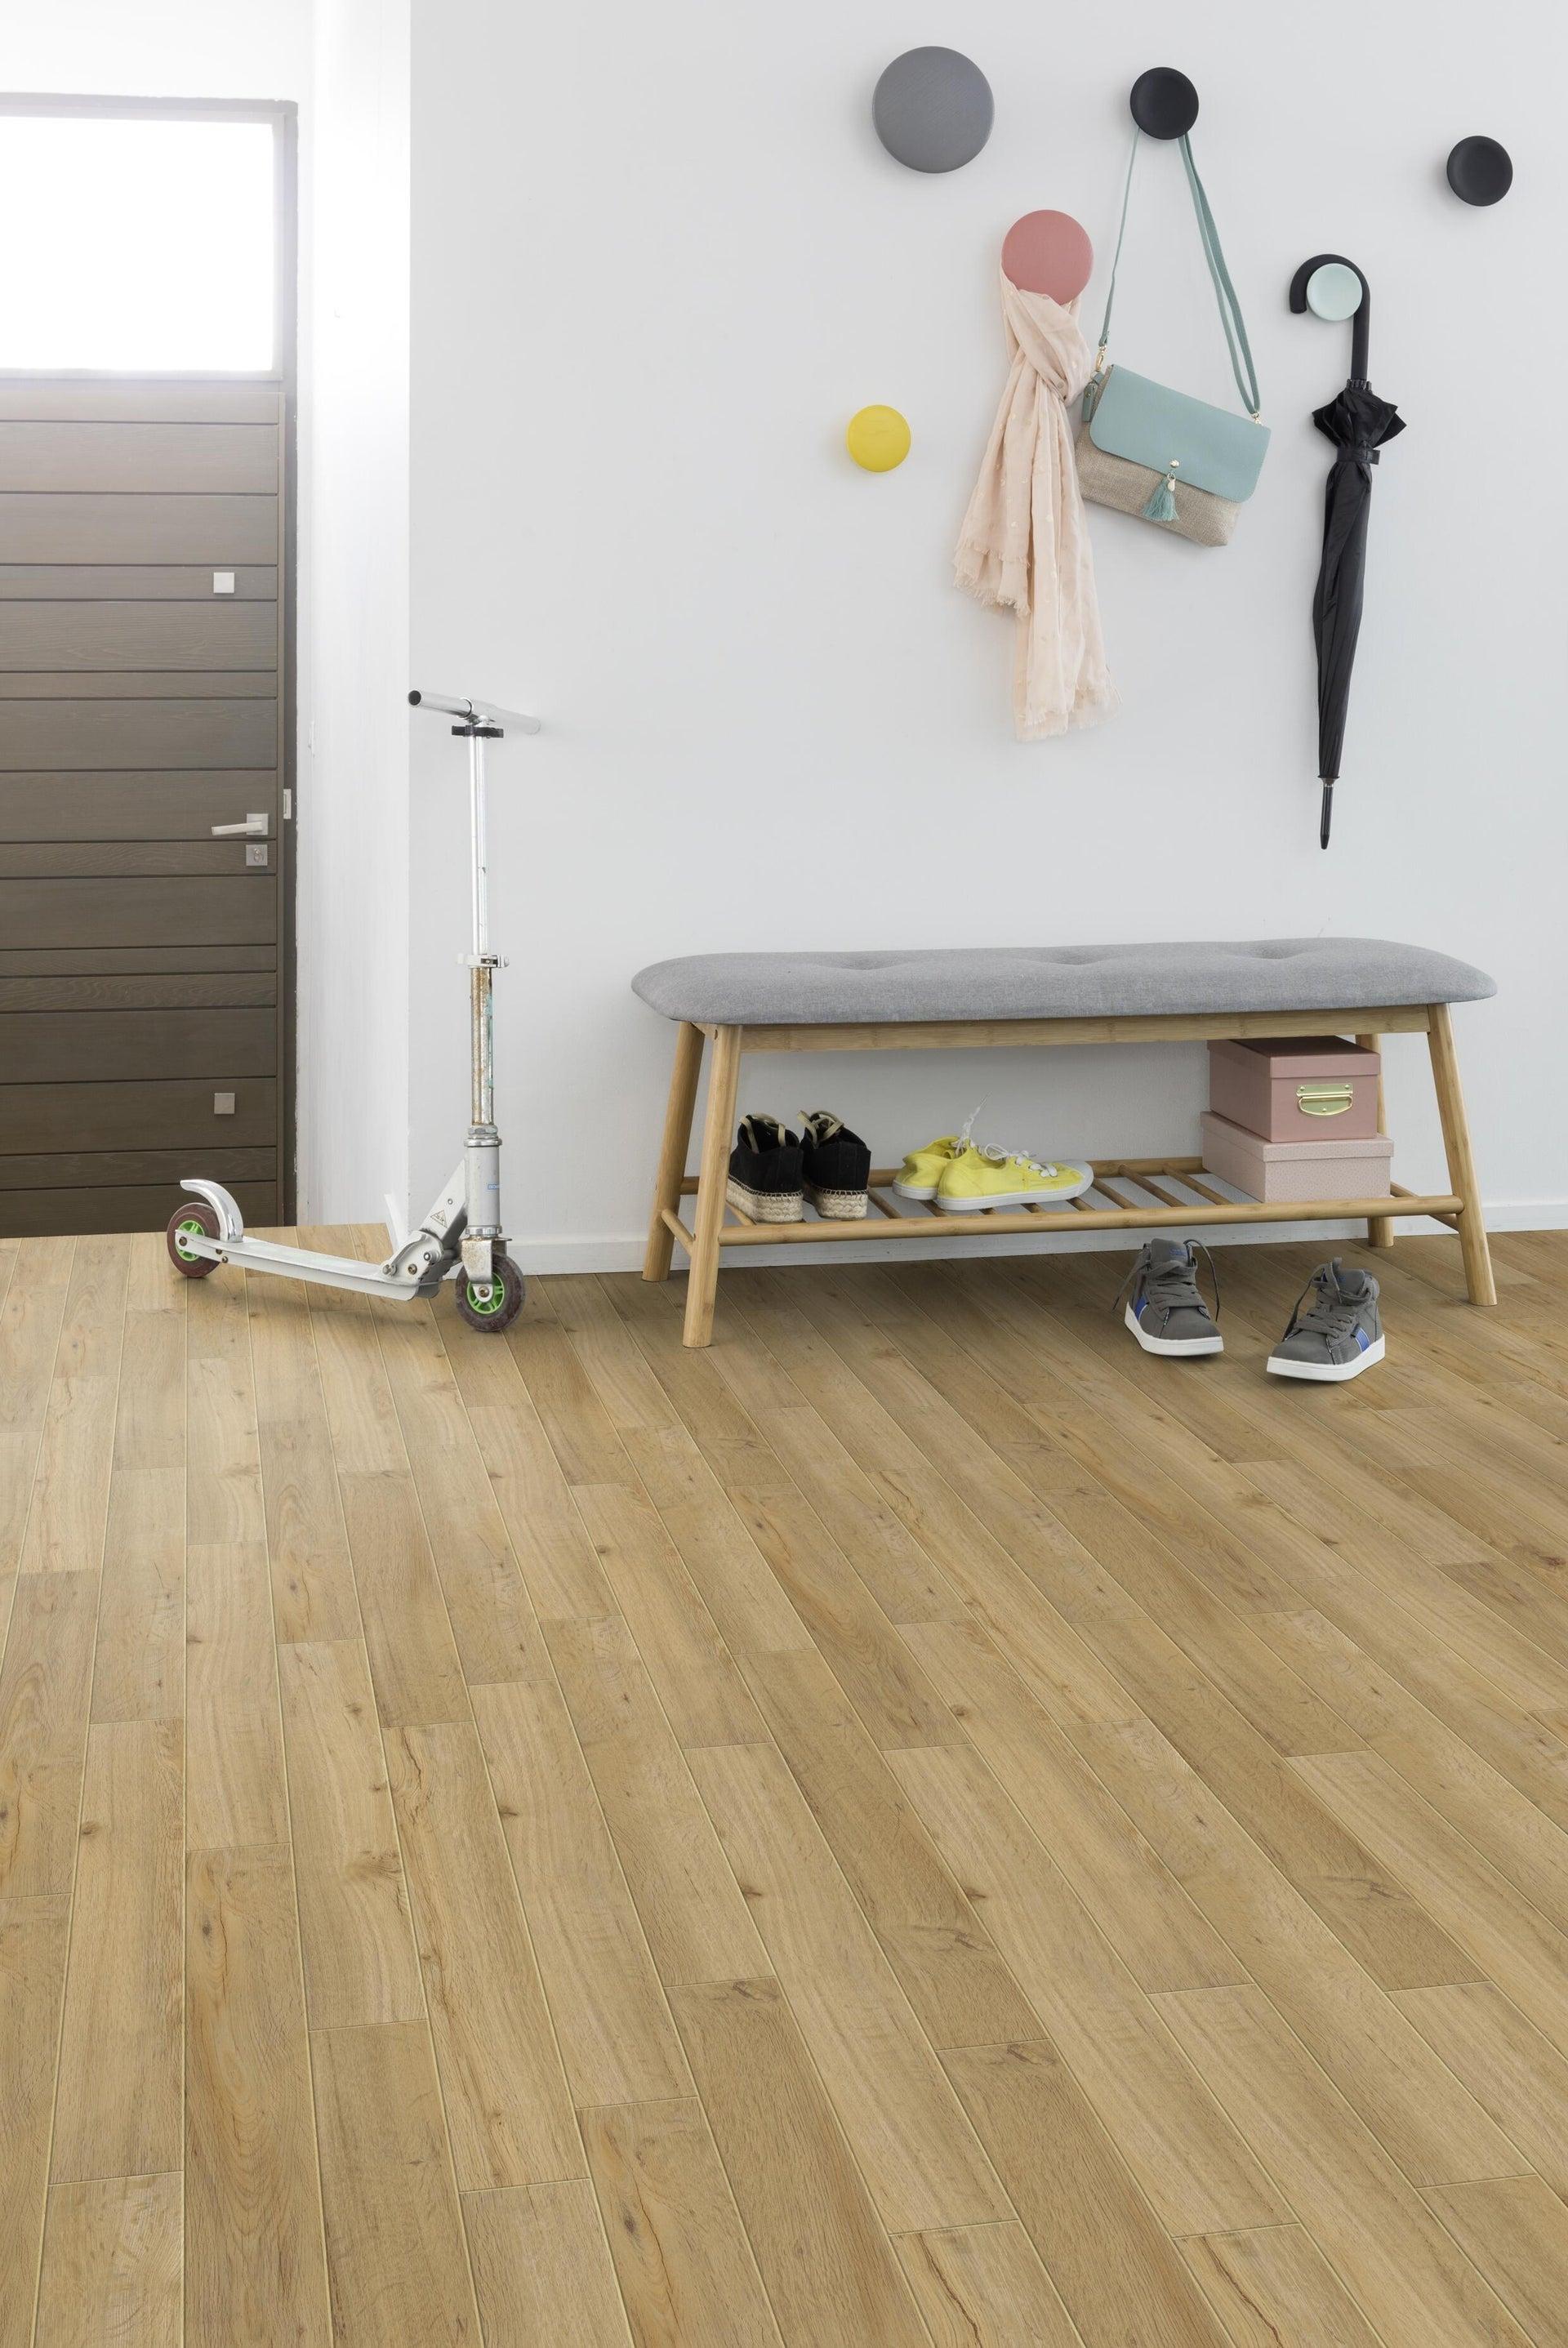 Pavimento PVC flottante clic+ Senso Premium Columbia Sp 4.5 mm giallo / dorato - 5